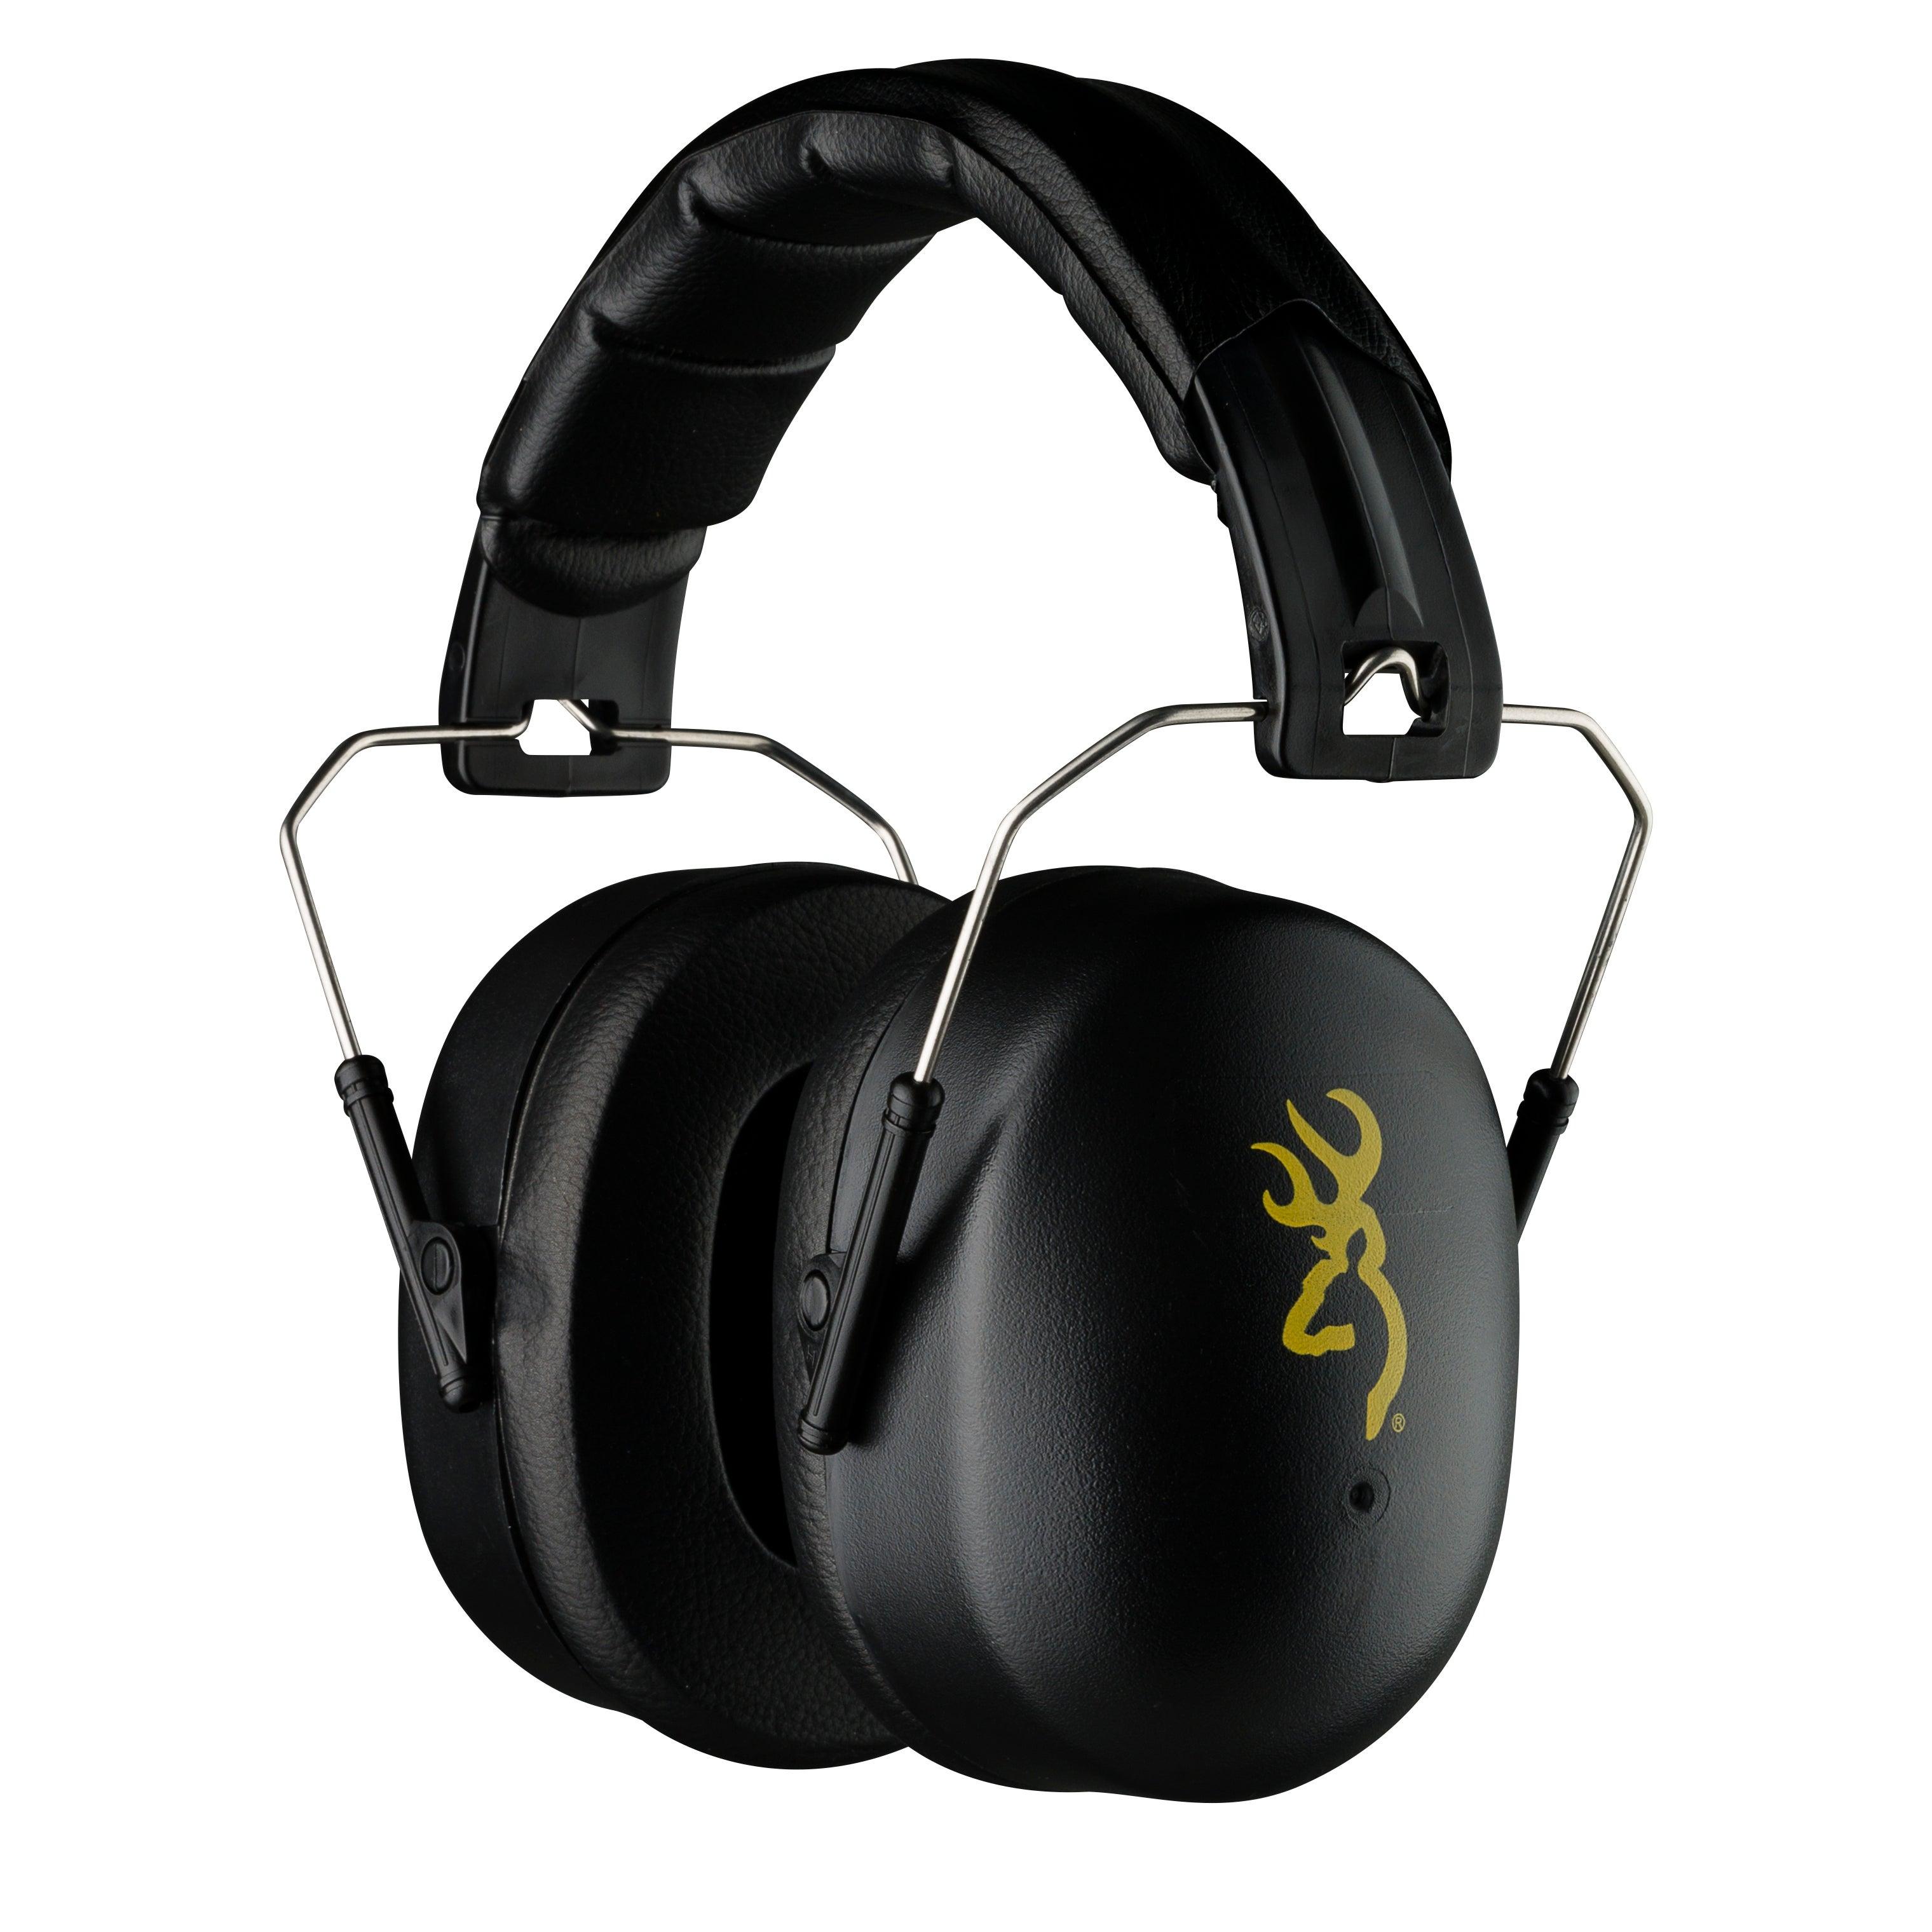 Hdr Hearing Protector